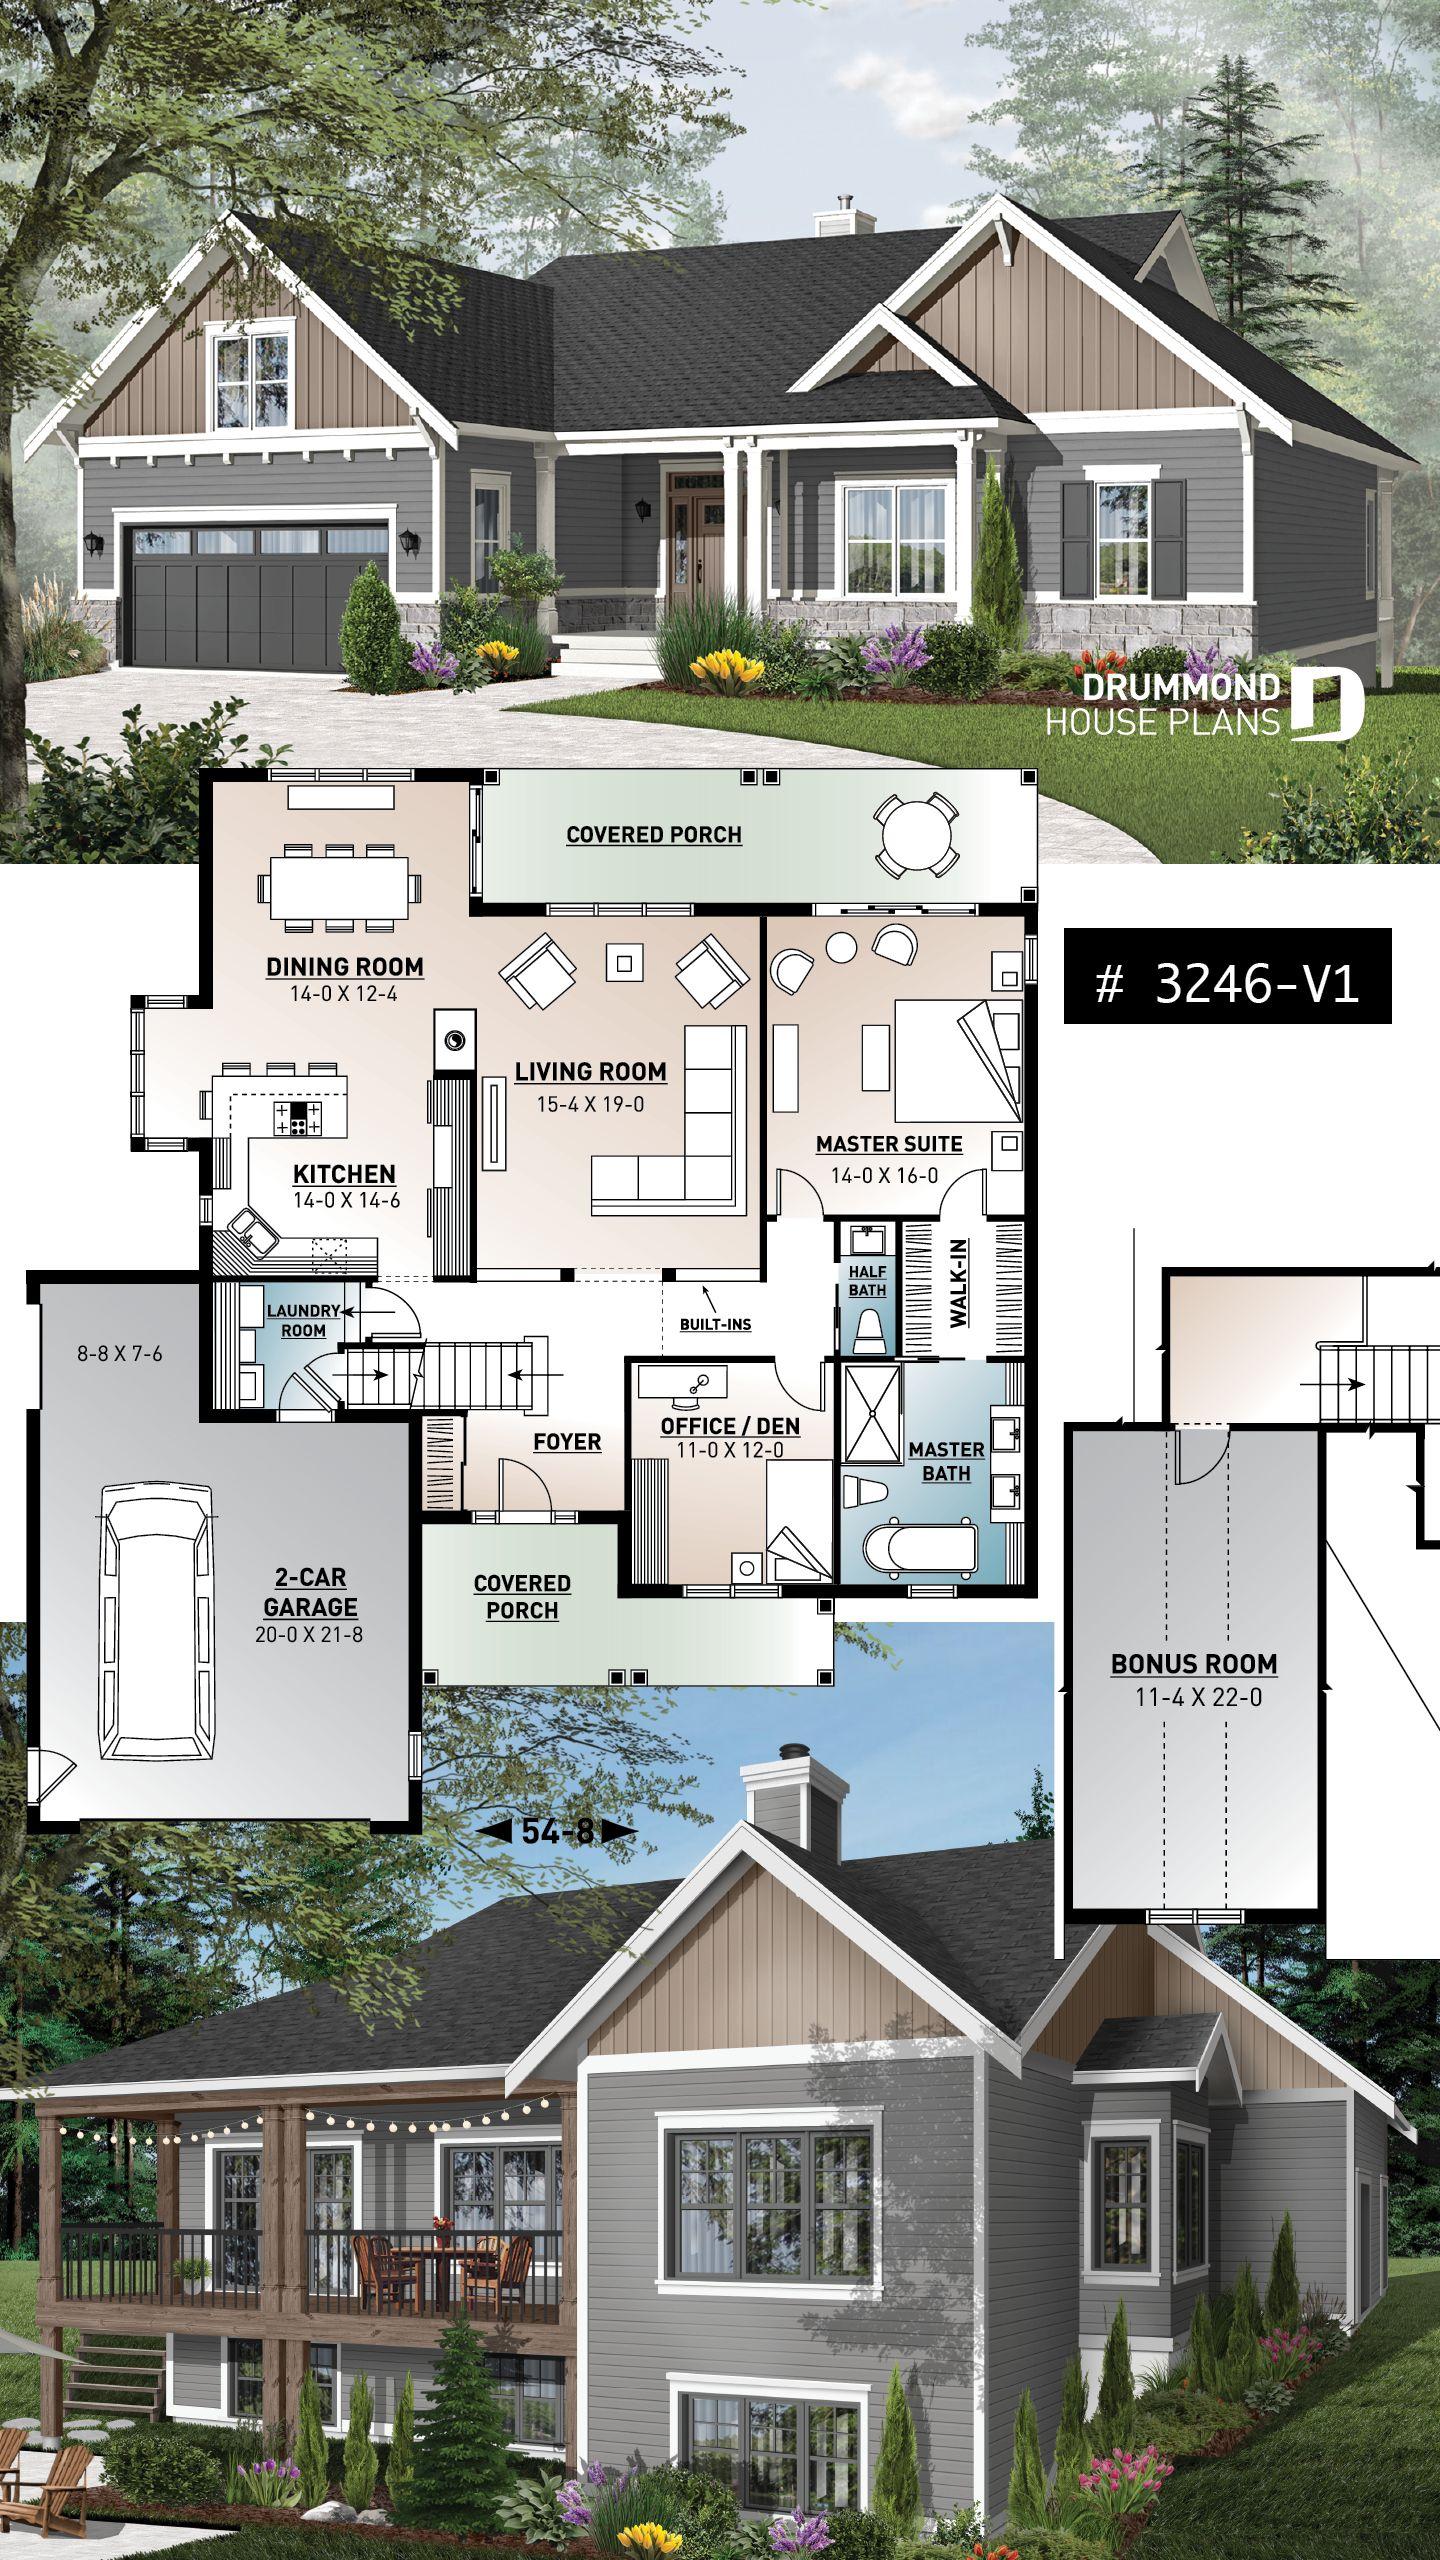 House Plan Aldergrove No 3246 V1 Craftsman House Plans